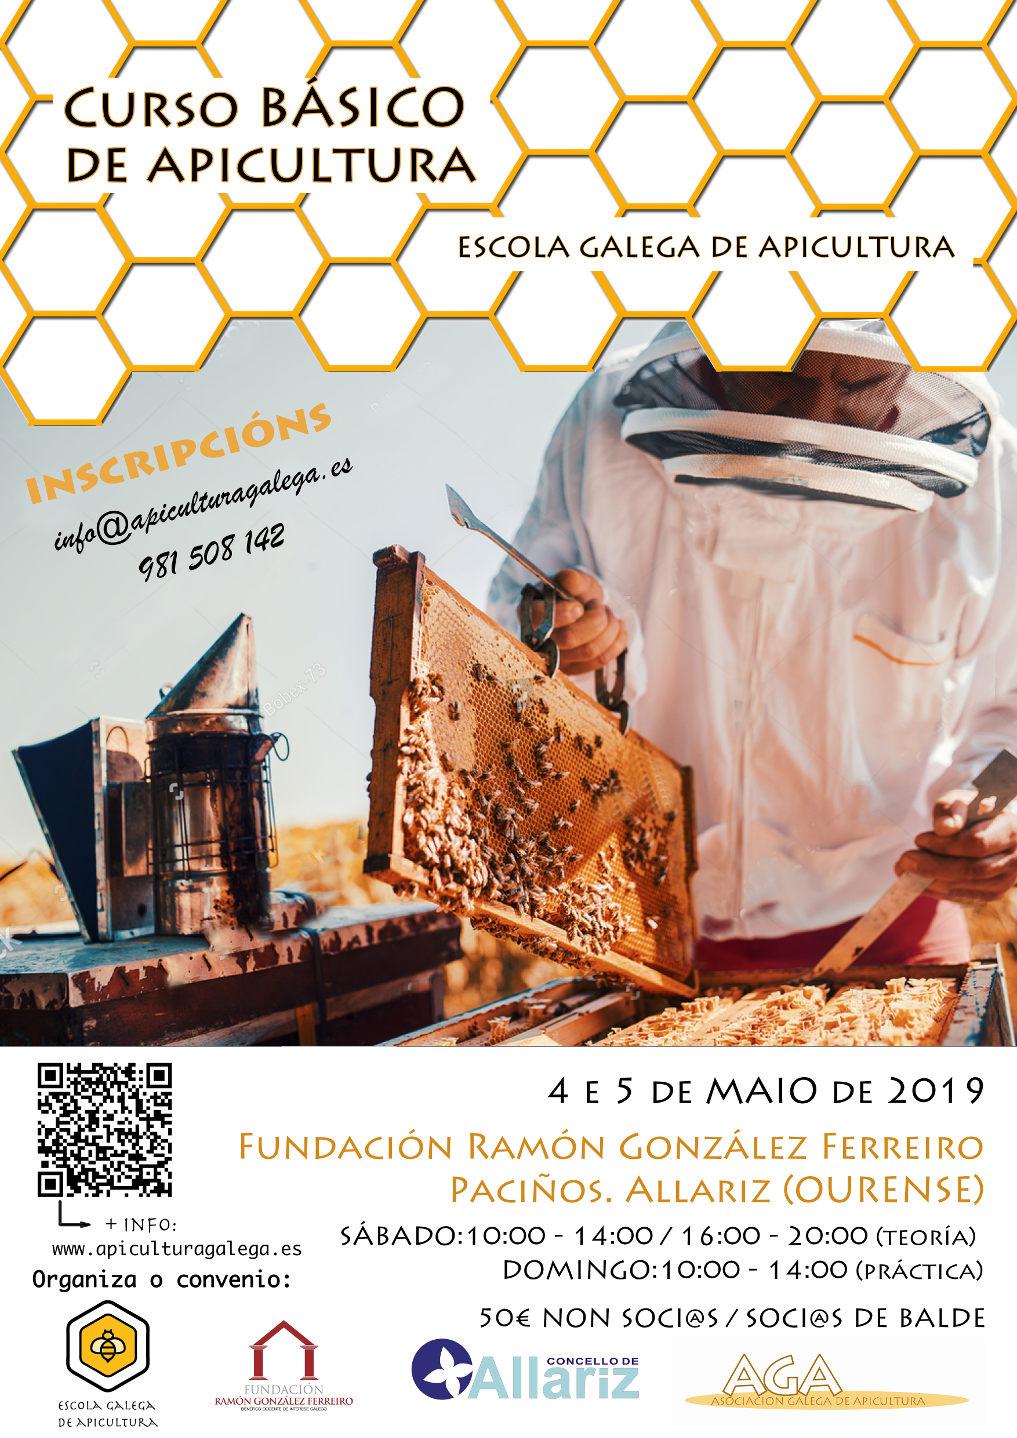 cartaz_curso basico apicultura 2019